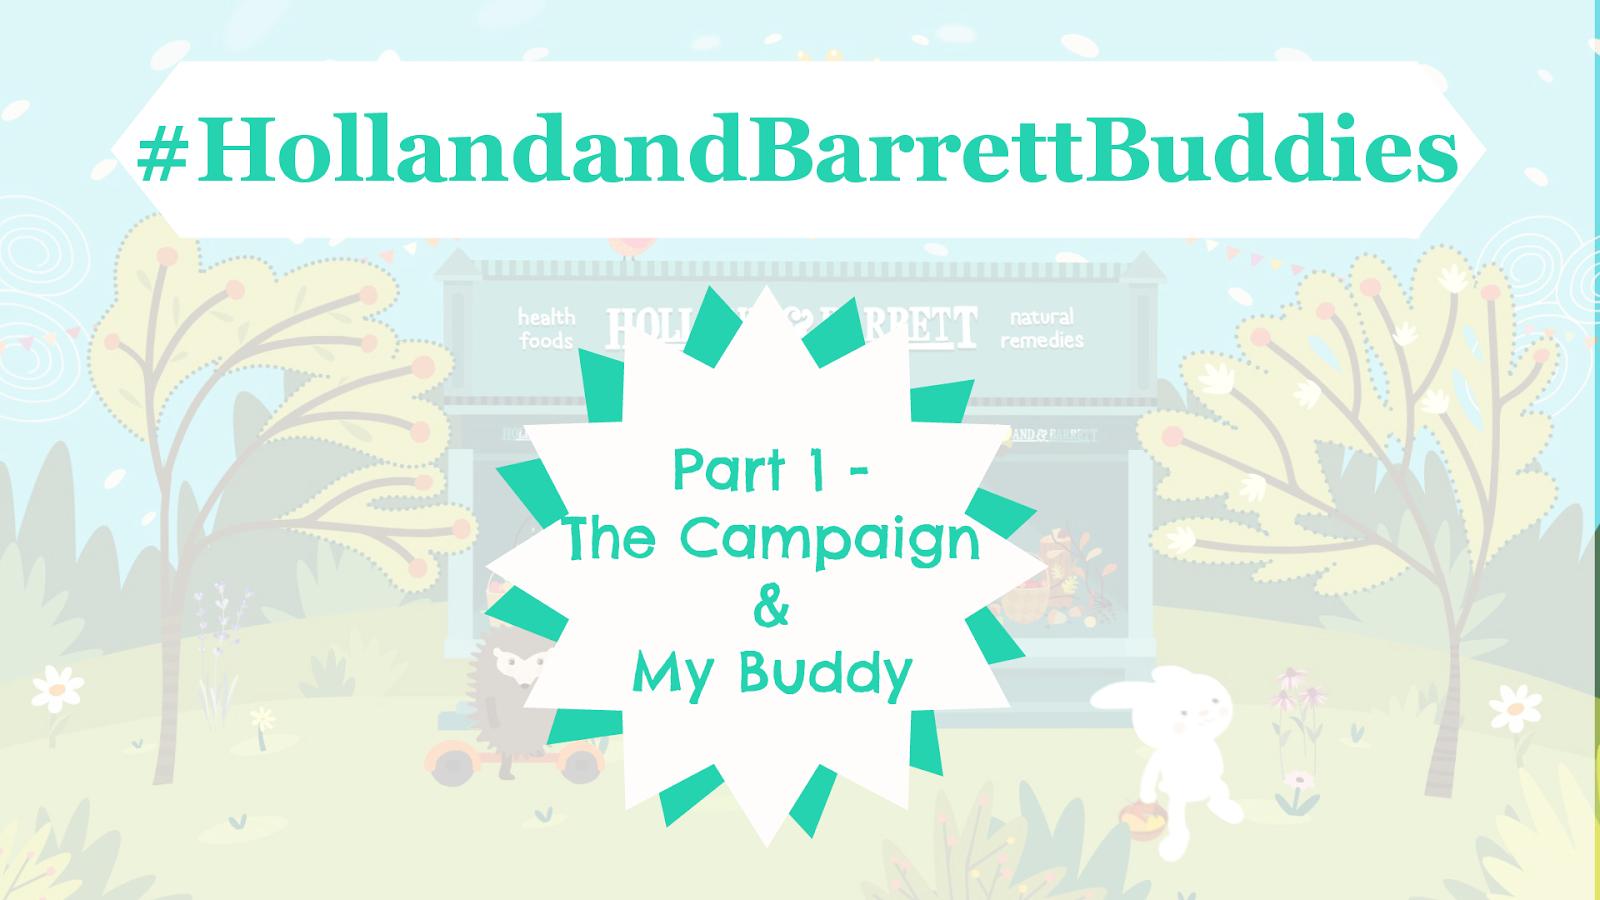 #HollandandBarrettBuddies-Holland-And-Barrett-Buddies